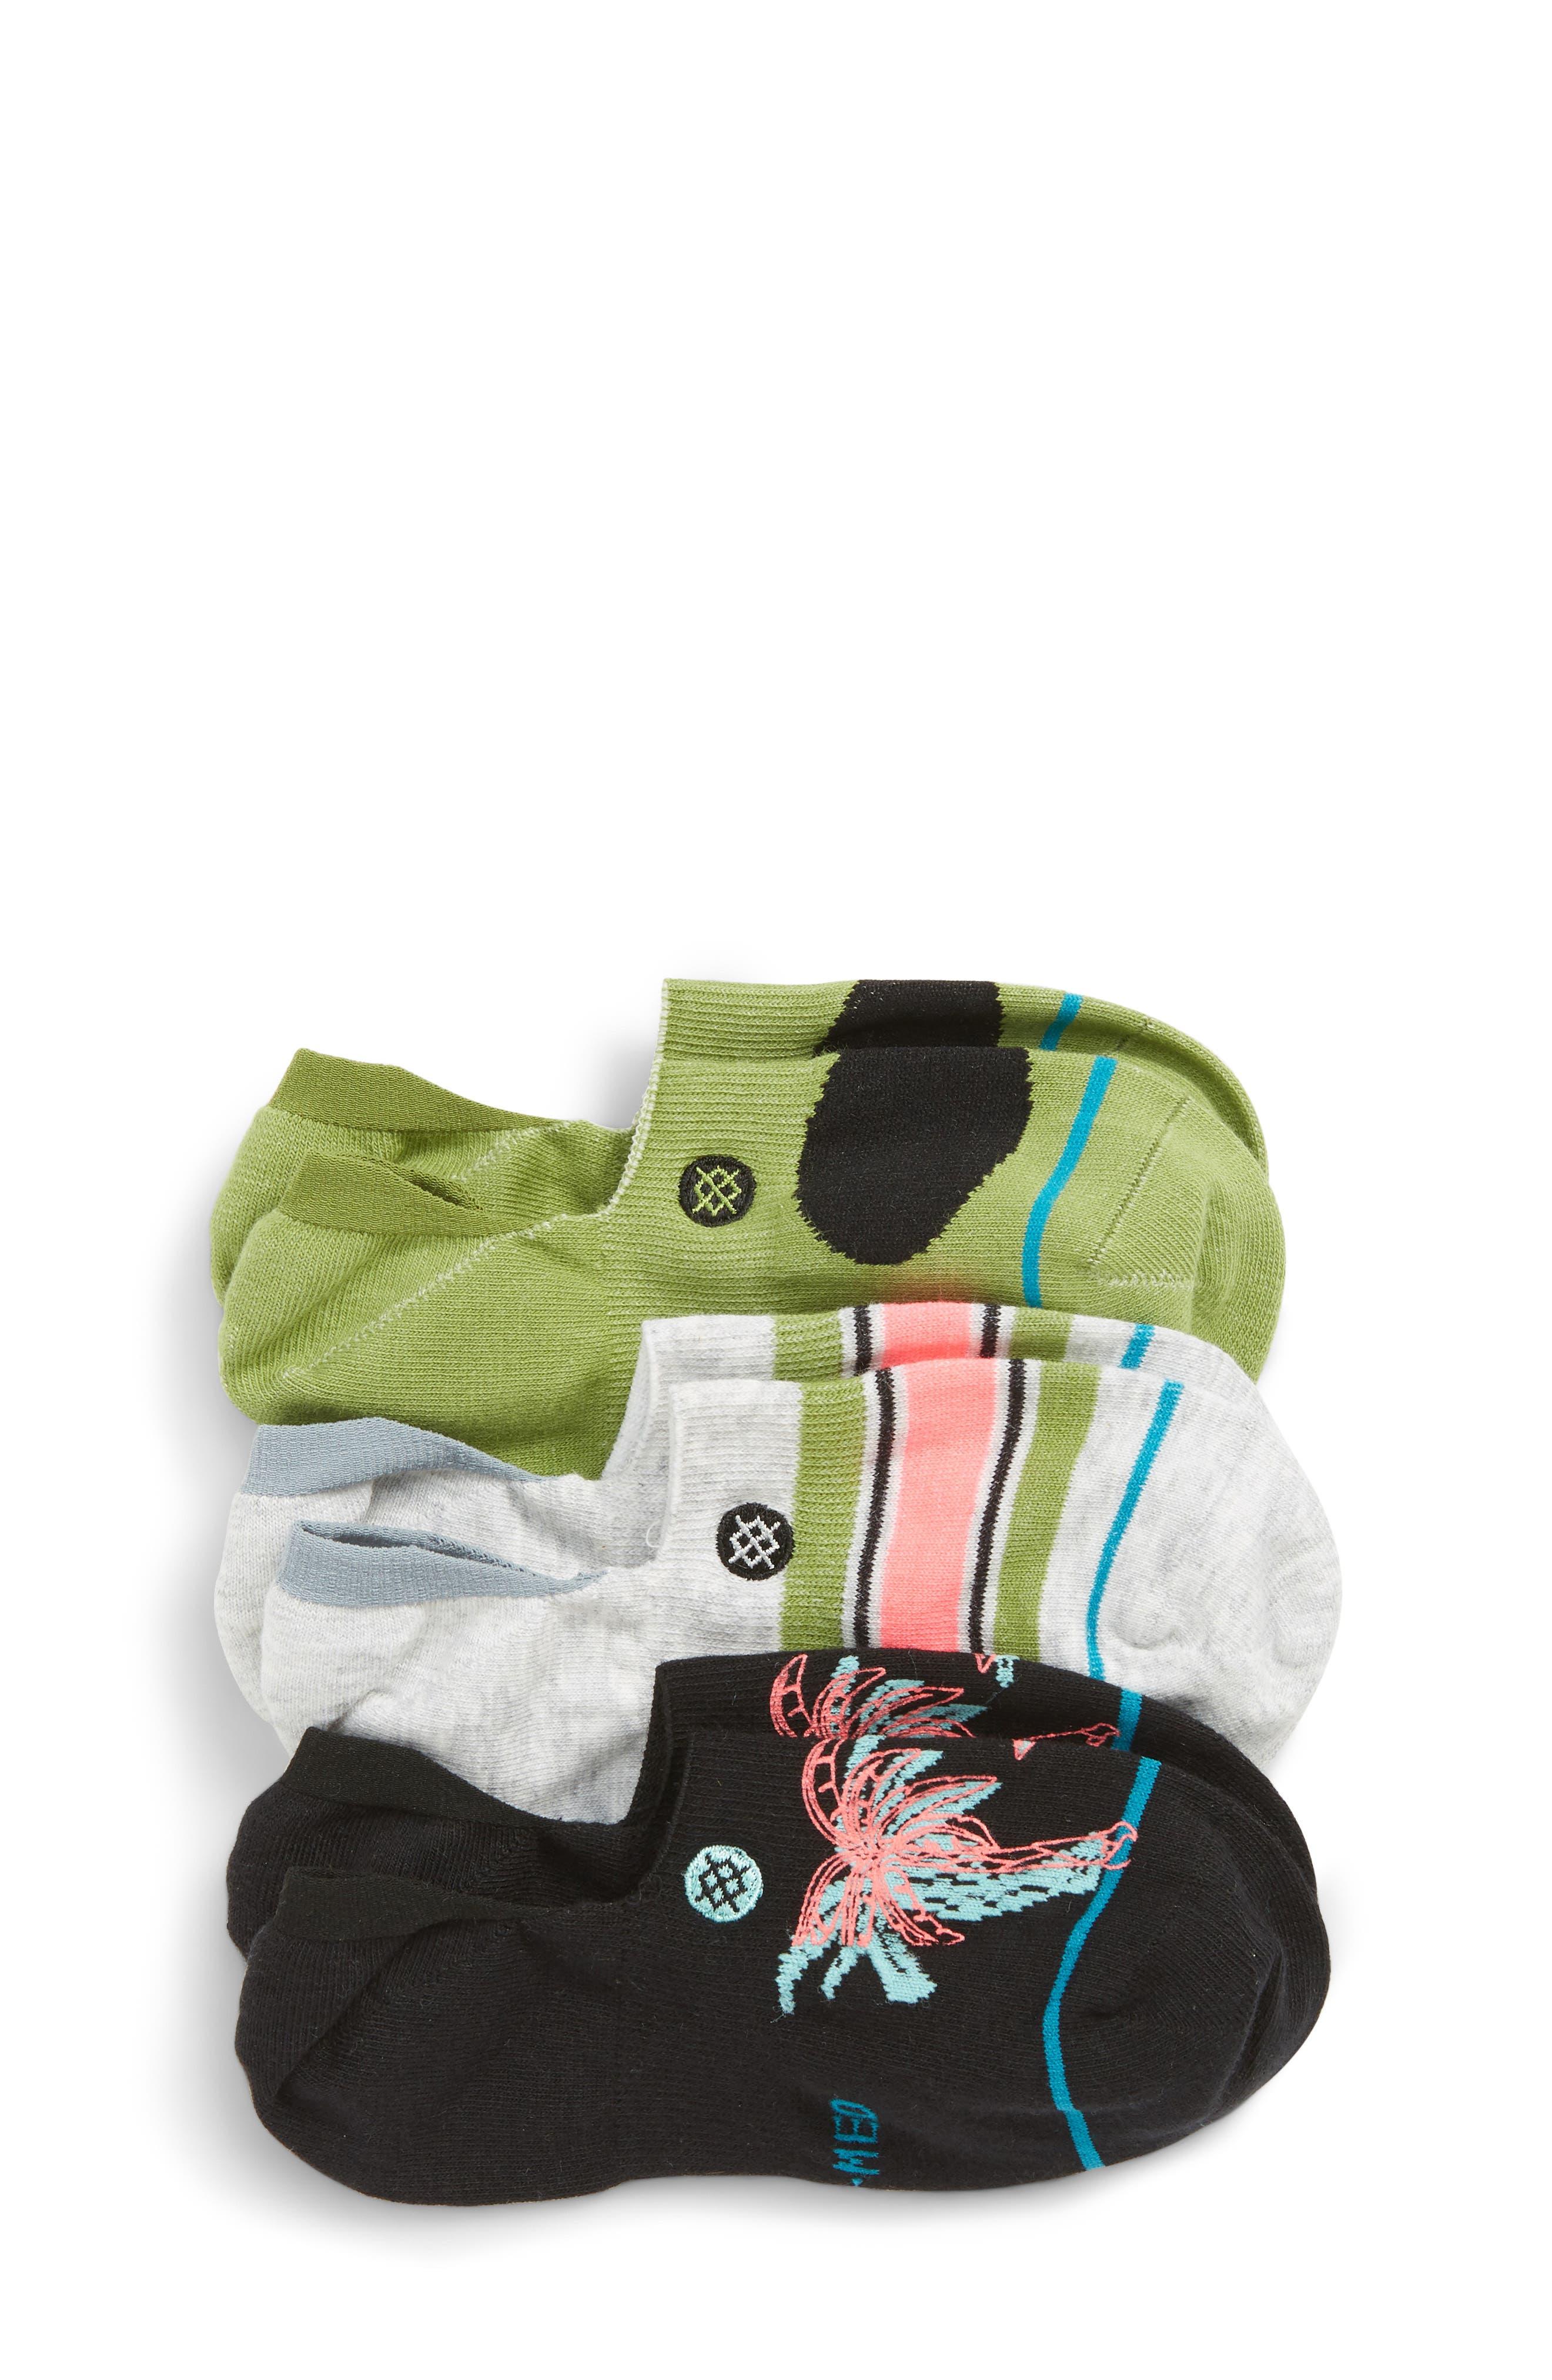 Toddler Stance Notsobasic 3Pack Low Socks Size Medium  Grey